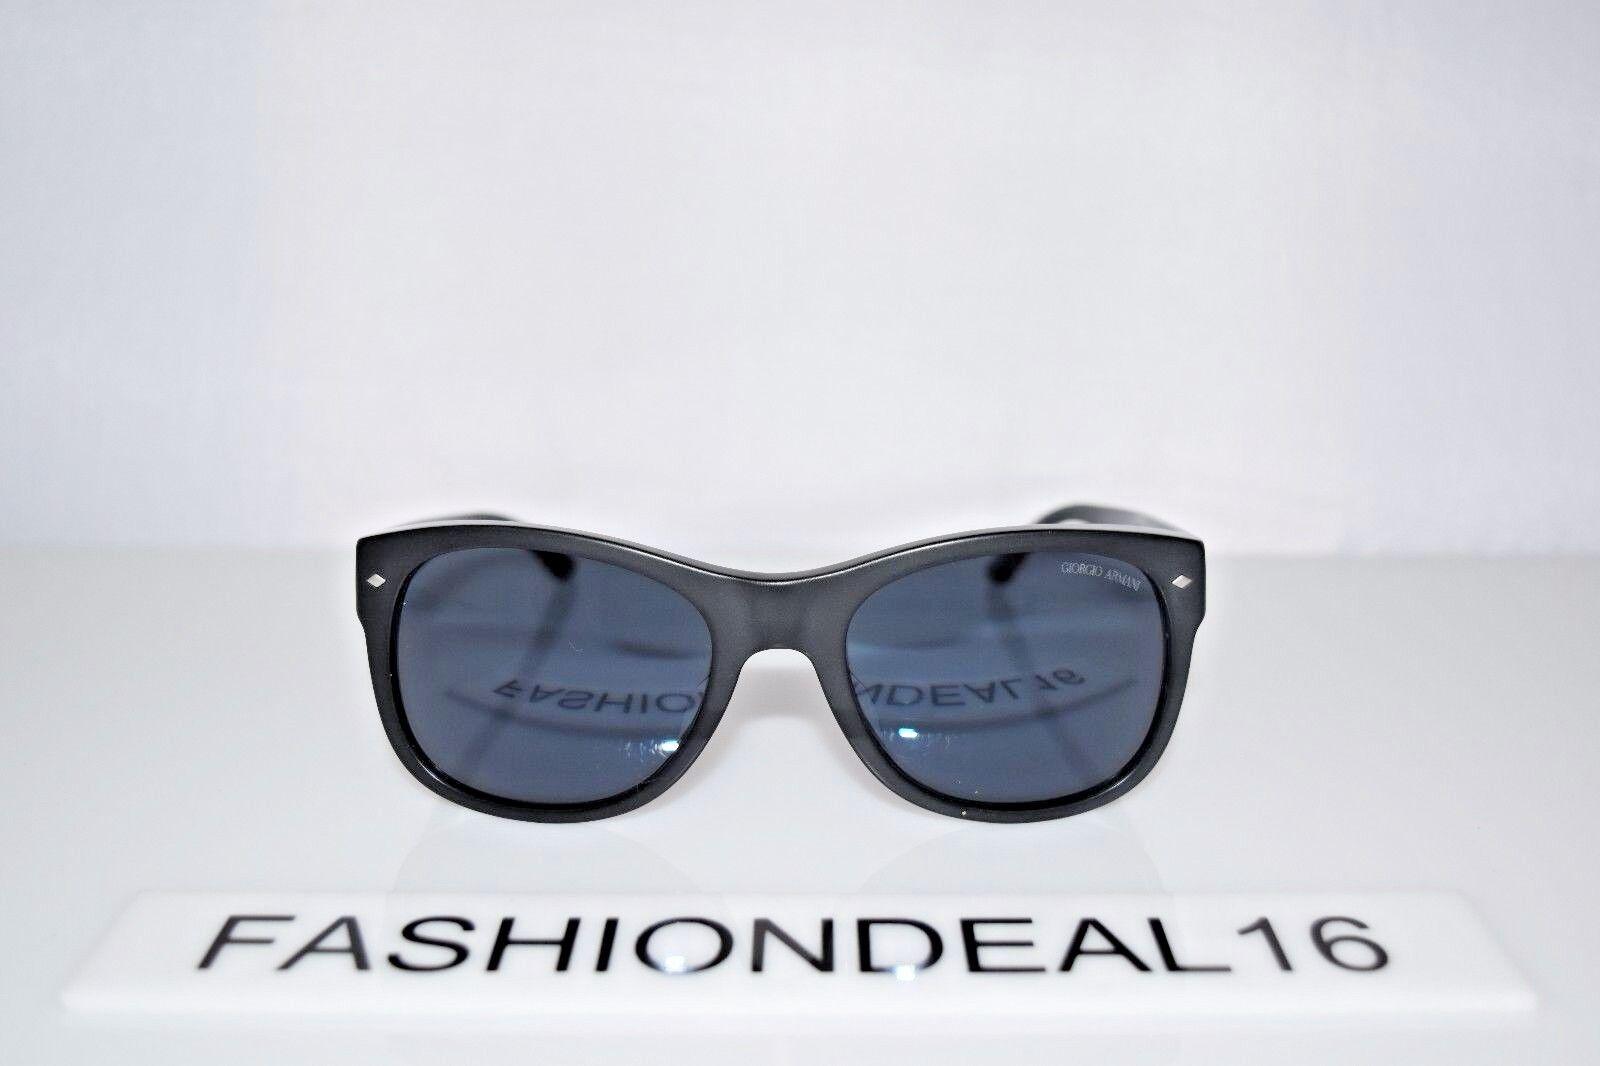 8c2a77ab3207 Giorgio Armani Sunglasses AR 8008 Black 5001 r5 Ar8008 for sale online